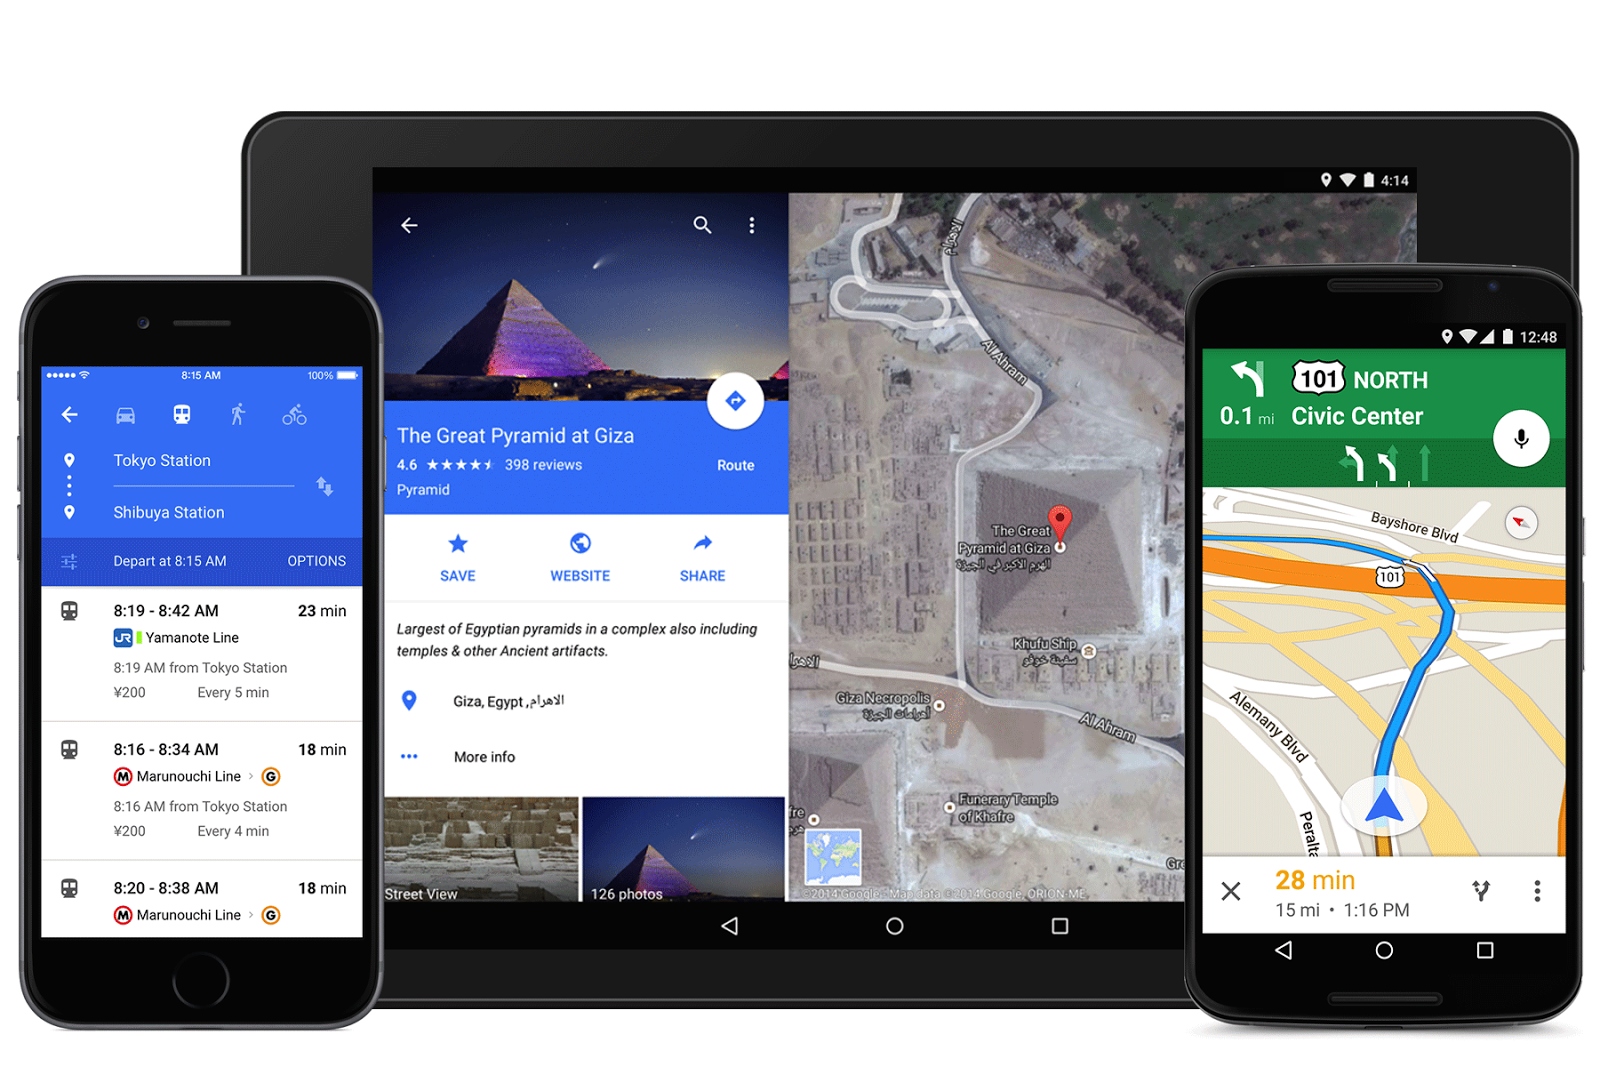 APK] Google Maps Gets a Major Material Design UI Update